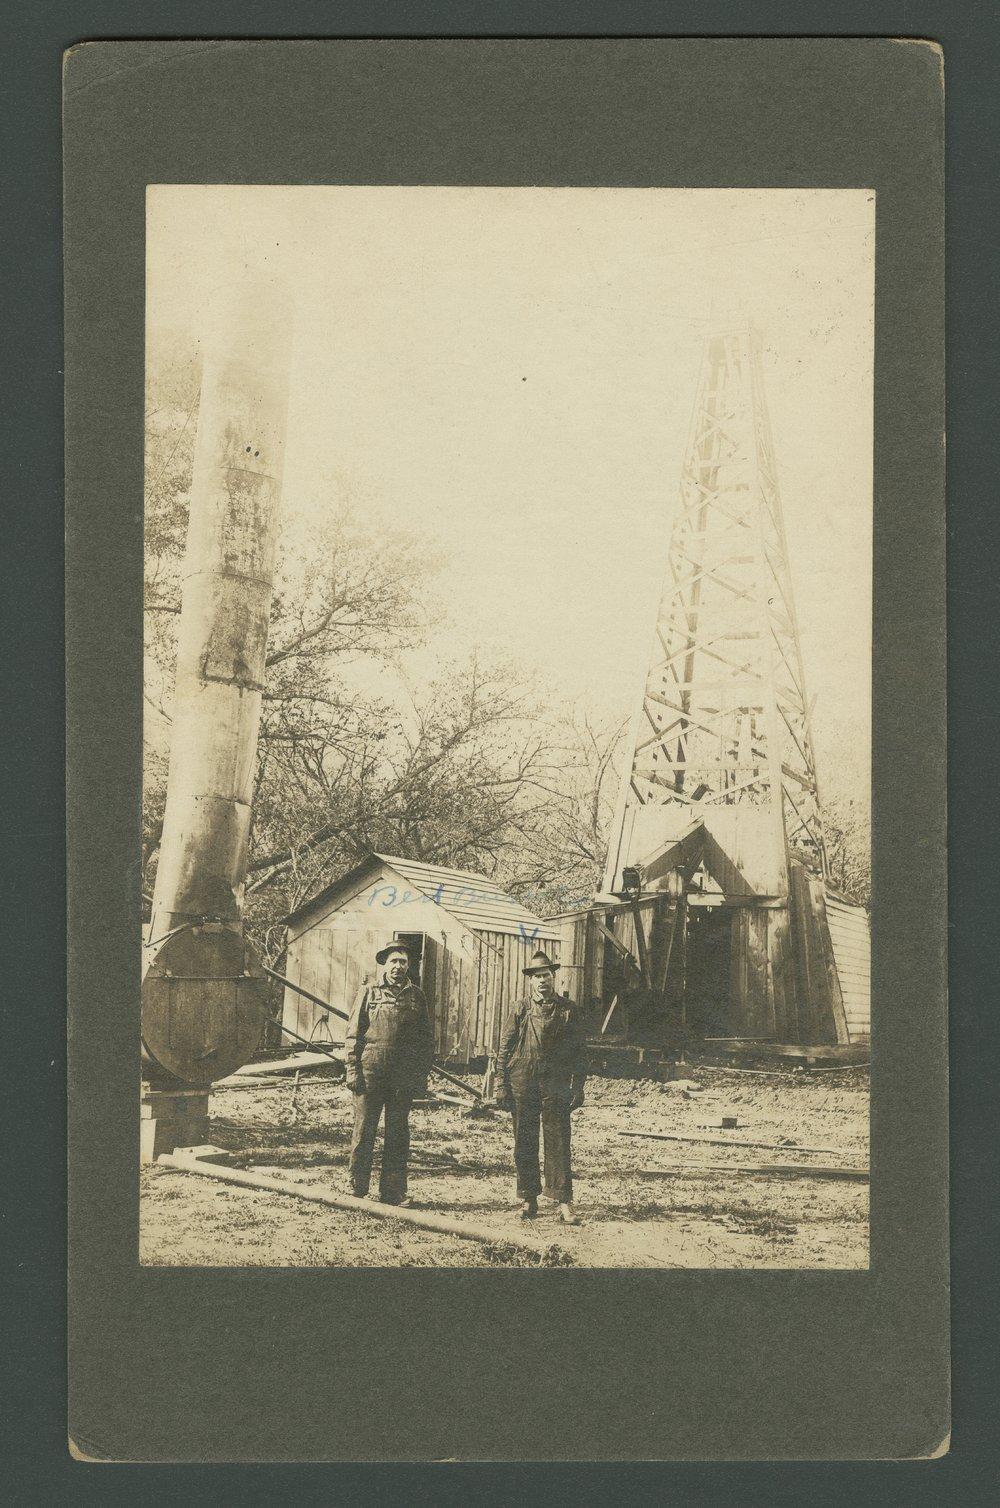 Skelly Oil Company, oil well #6, Augusta, Kansas - 3